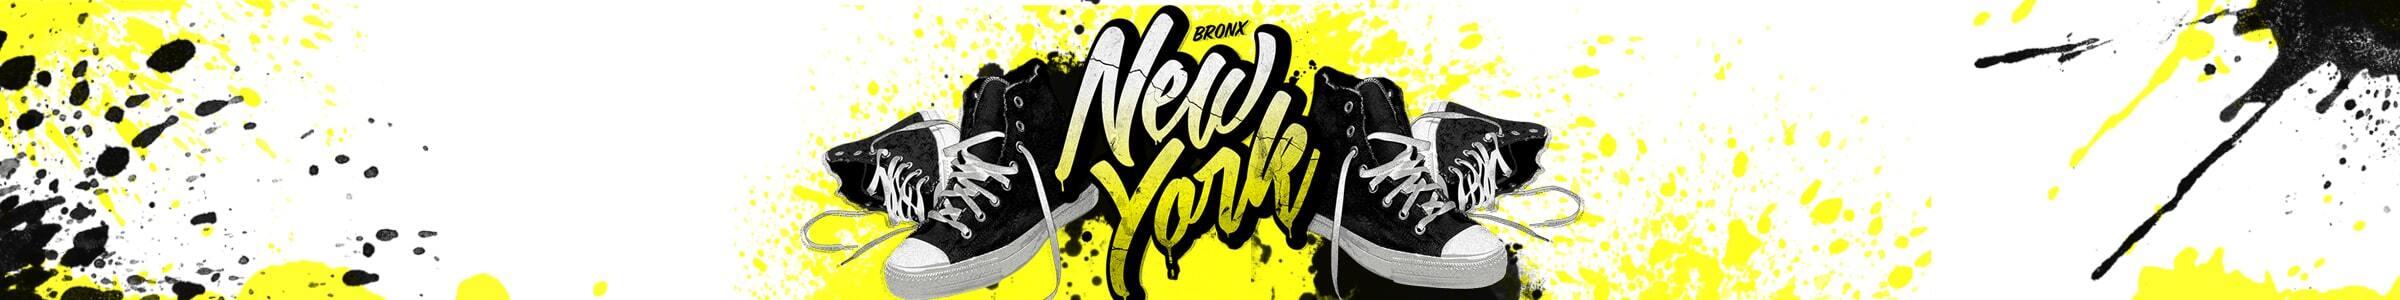 Category_Teaser_Header_New_York_2400x300